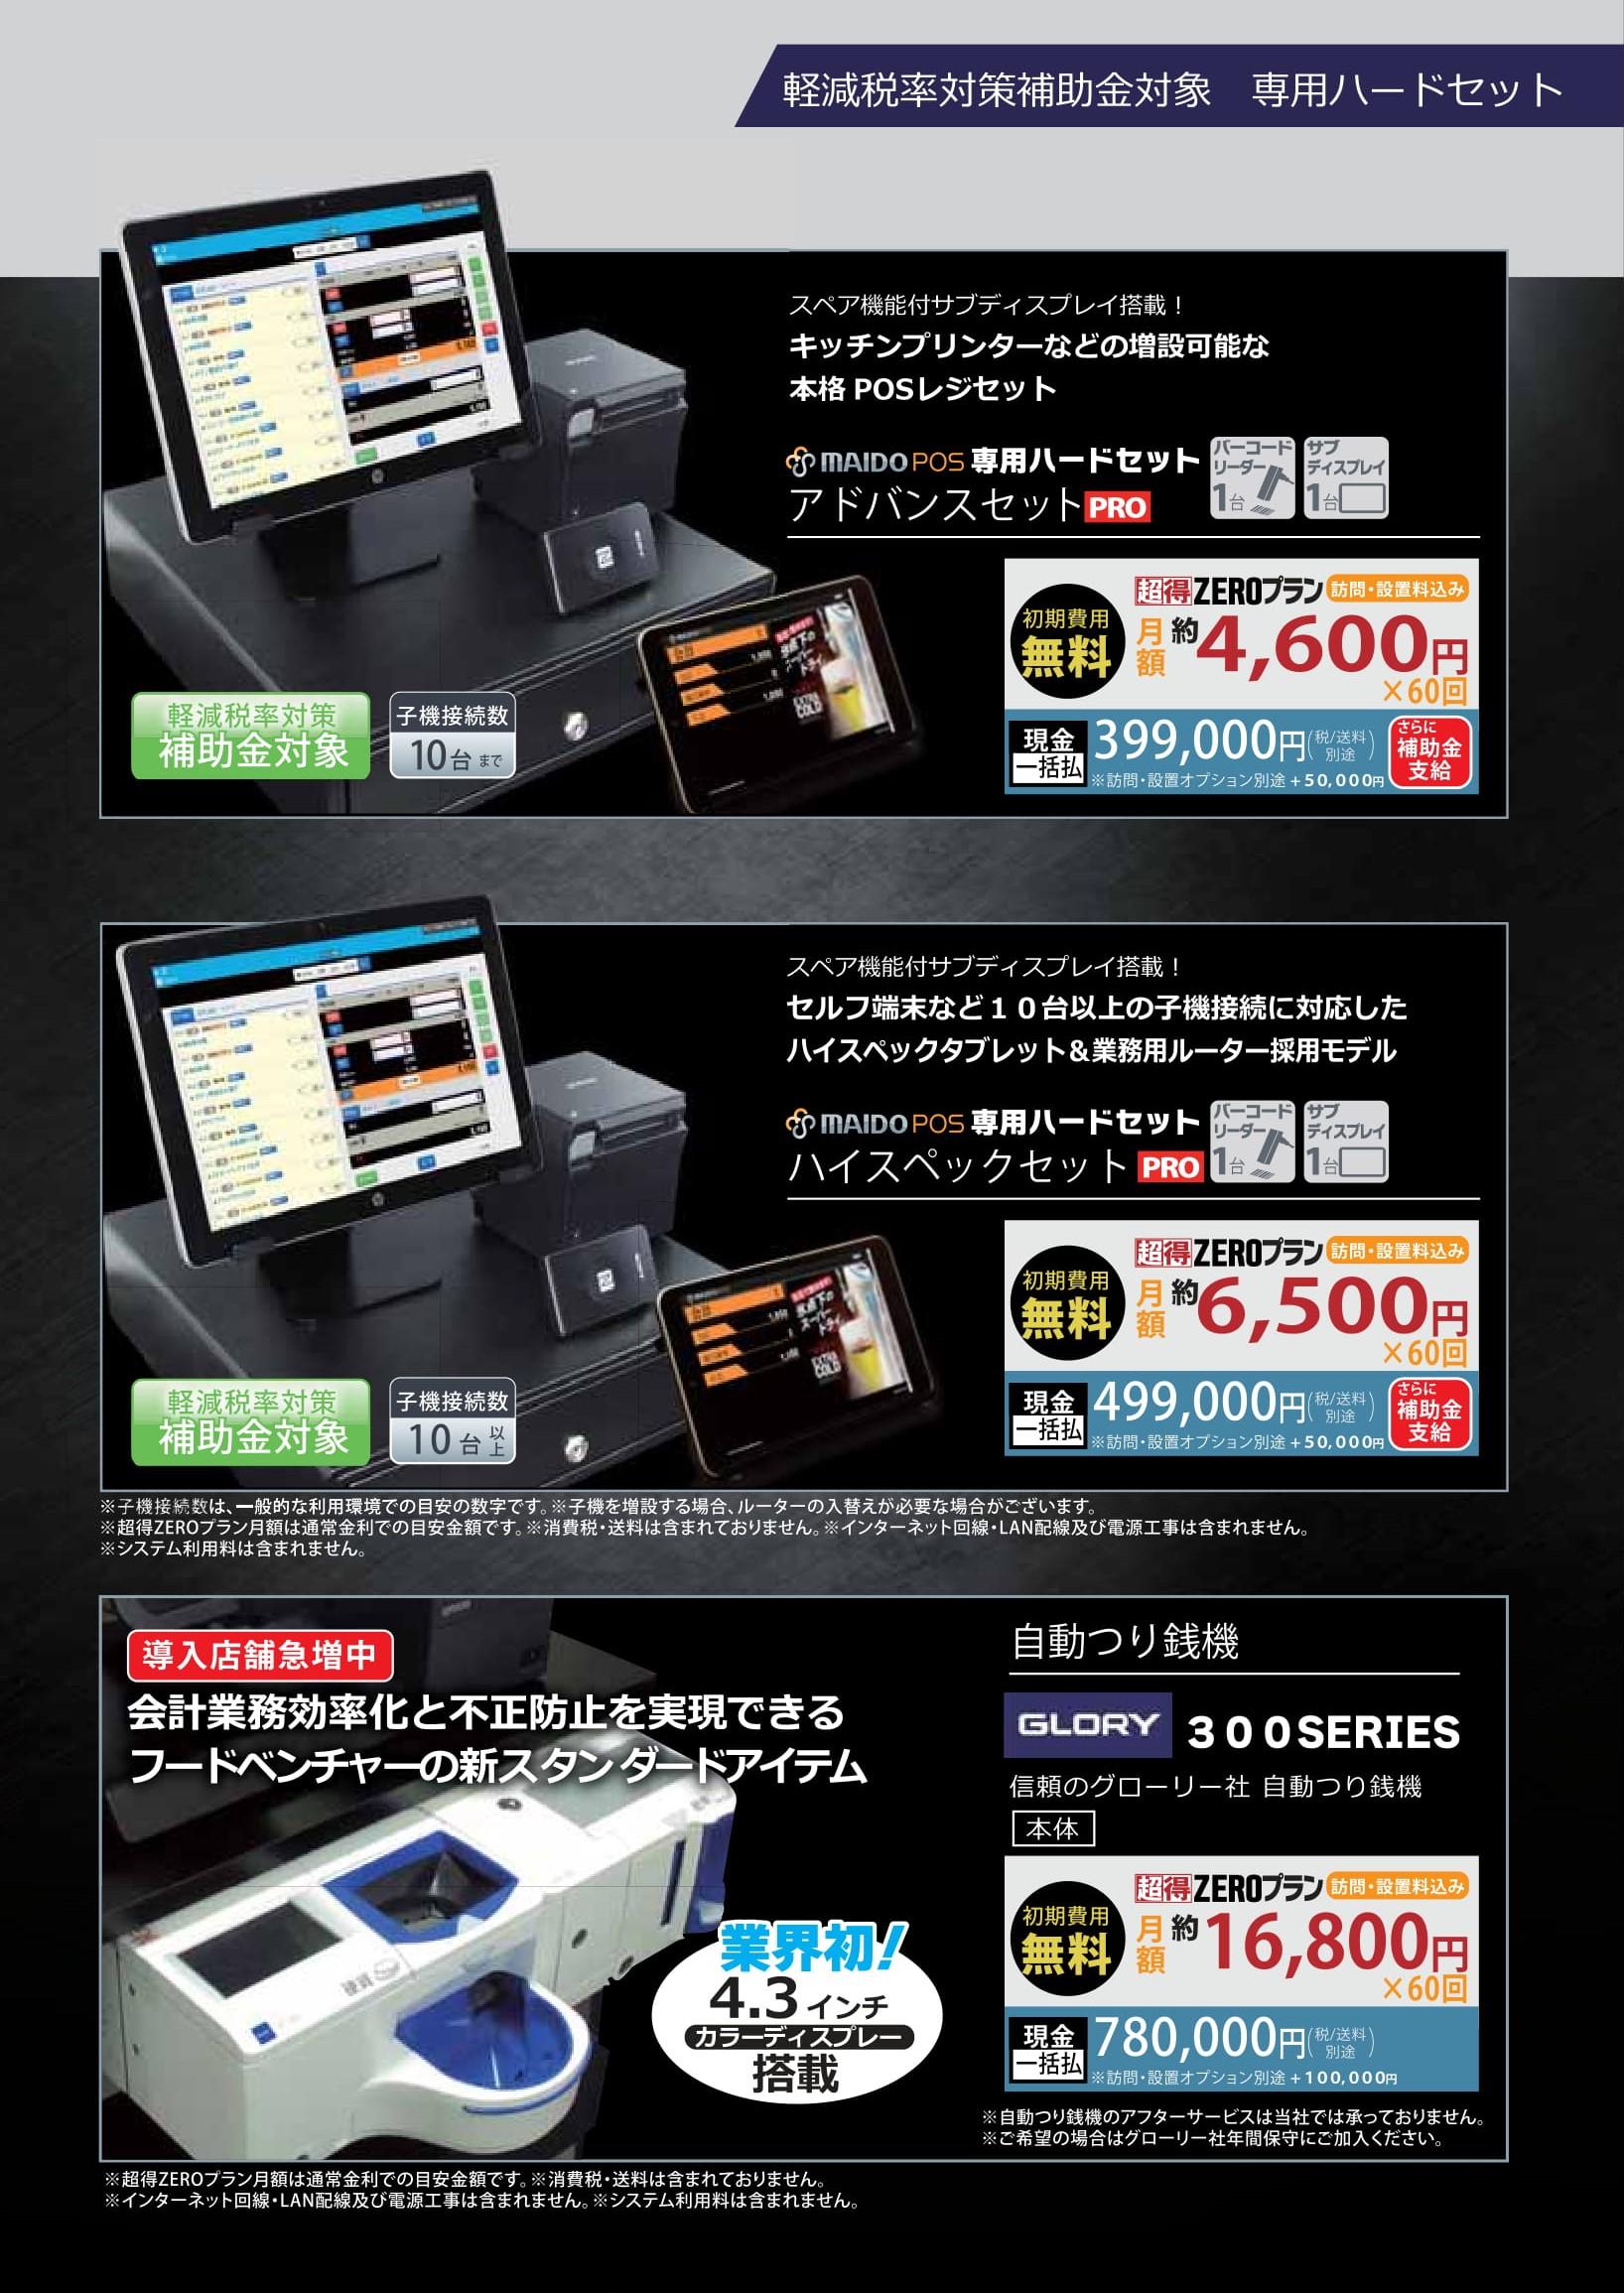 POSレジ専用標準ハードセット、自動つり銭機の価格表